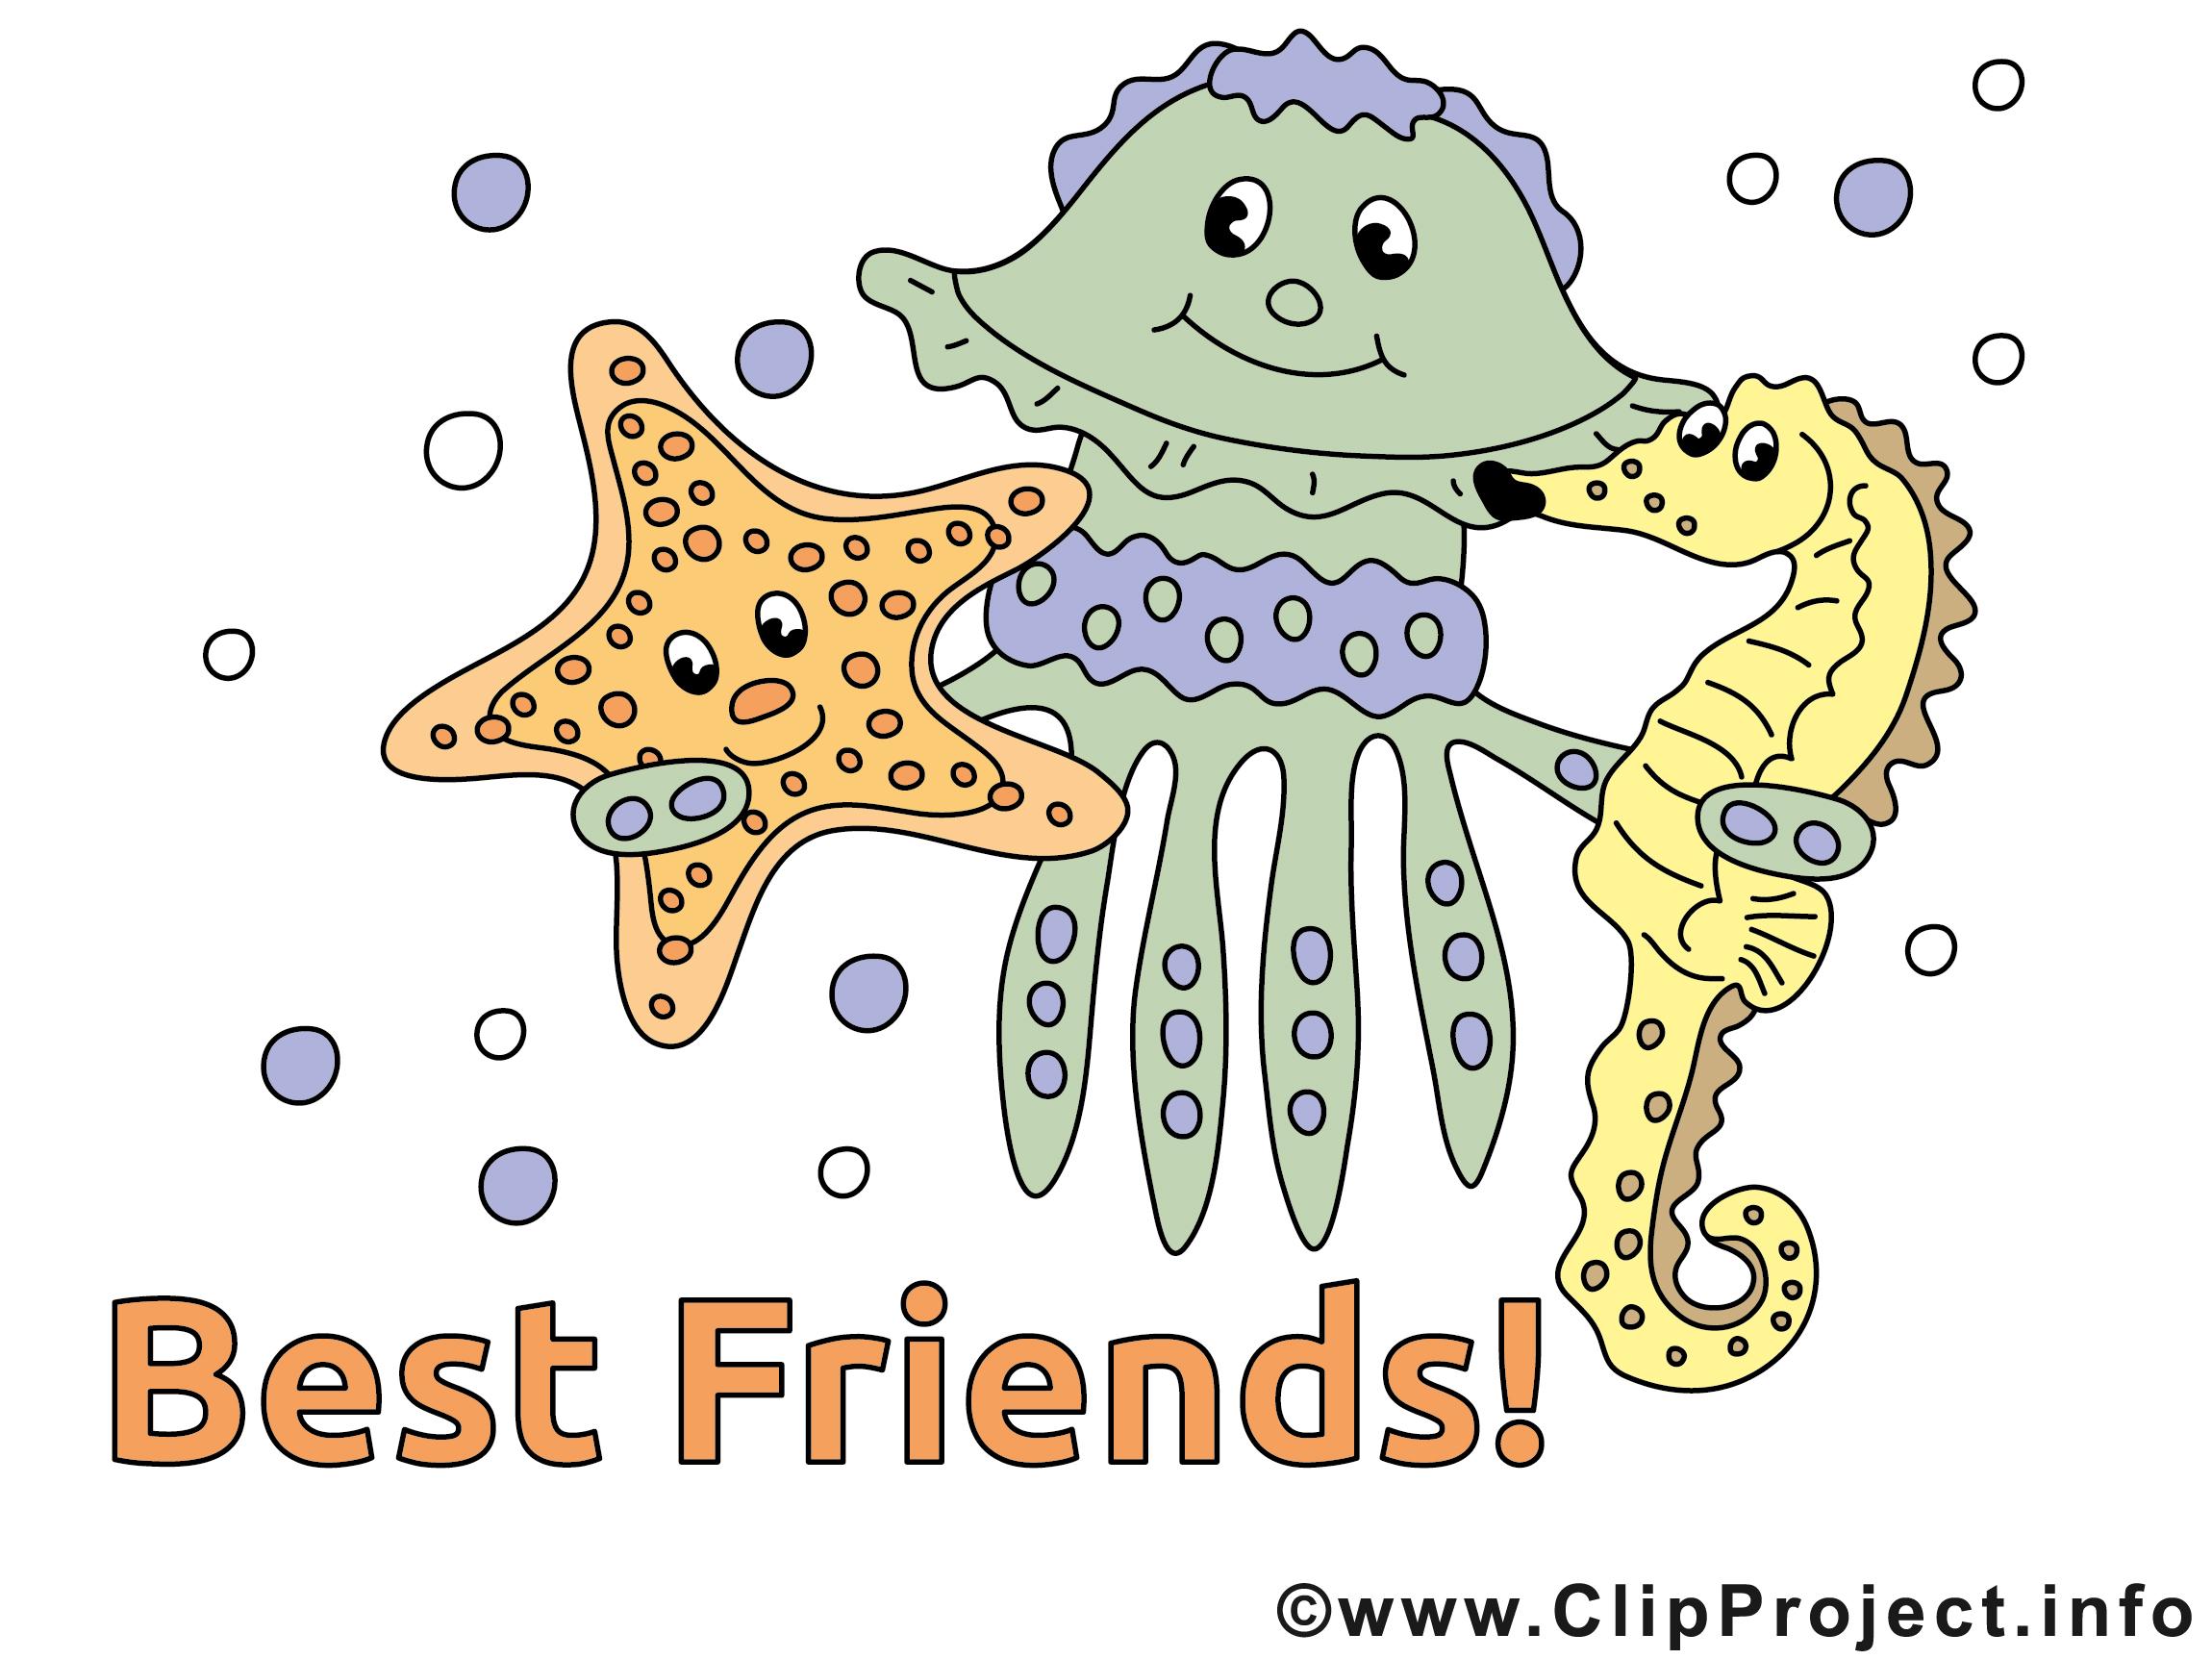 Bild Beste Freunde